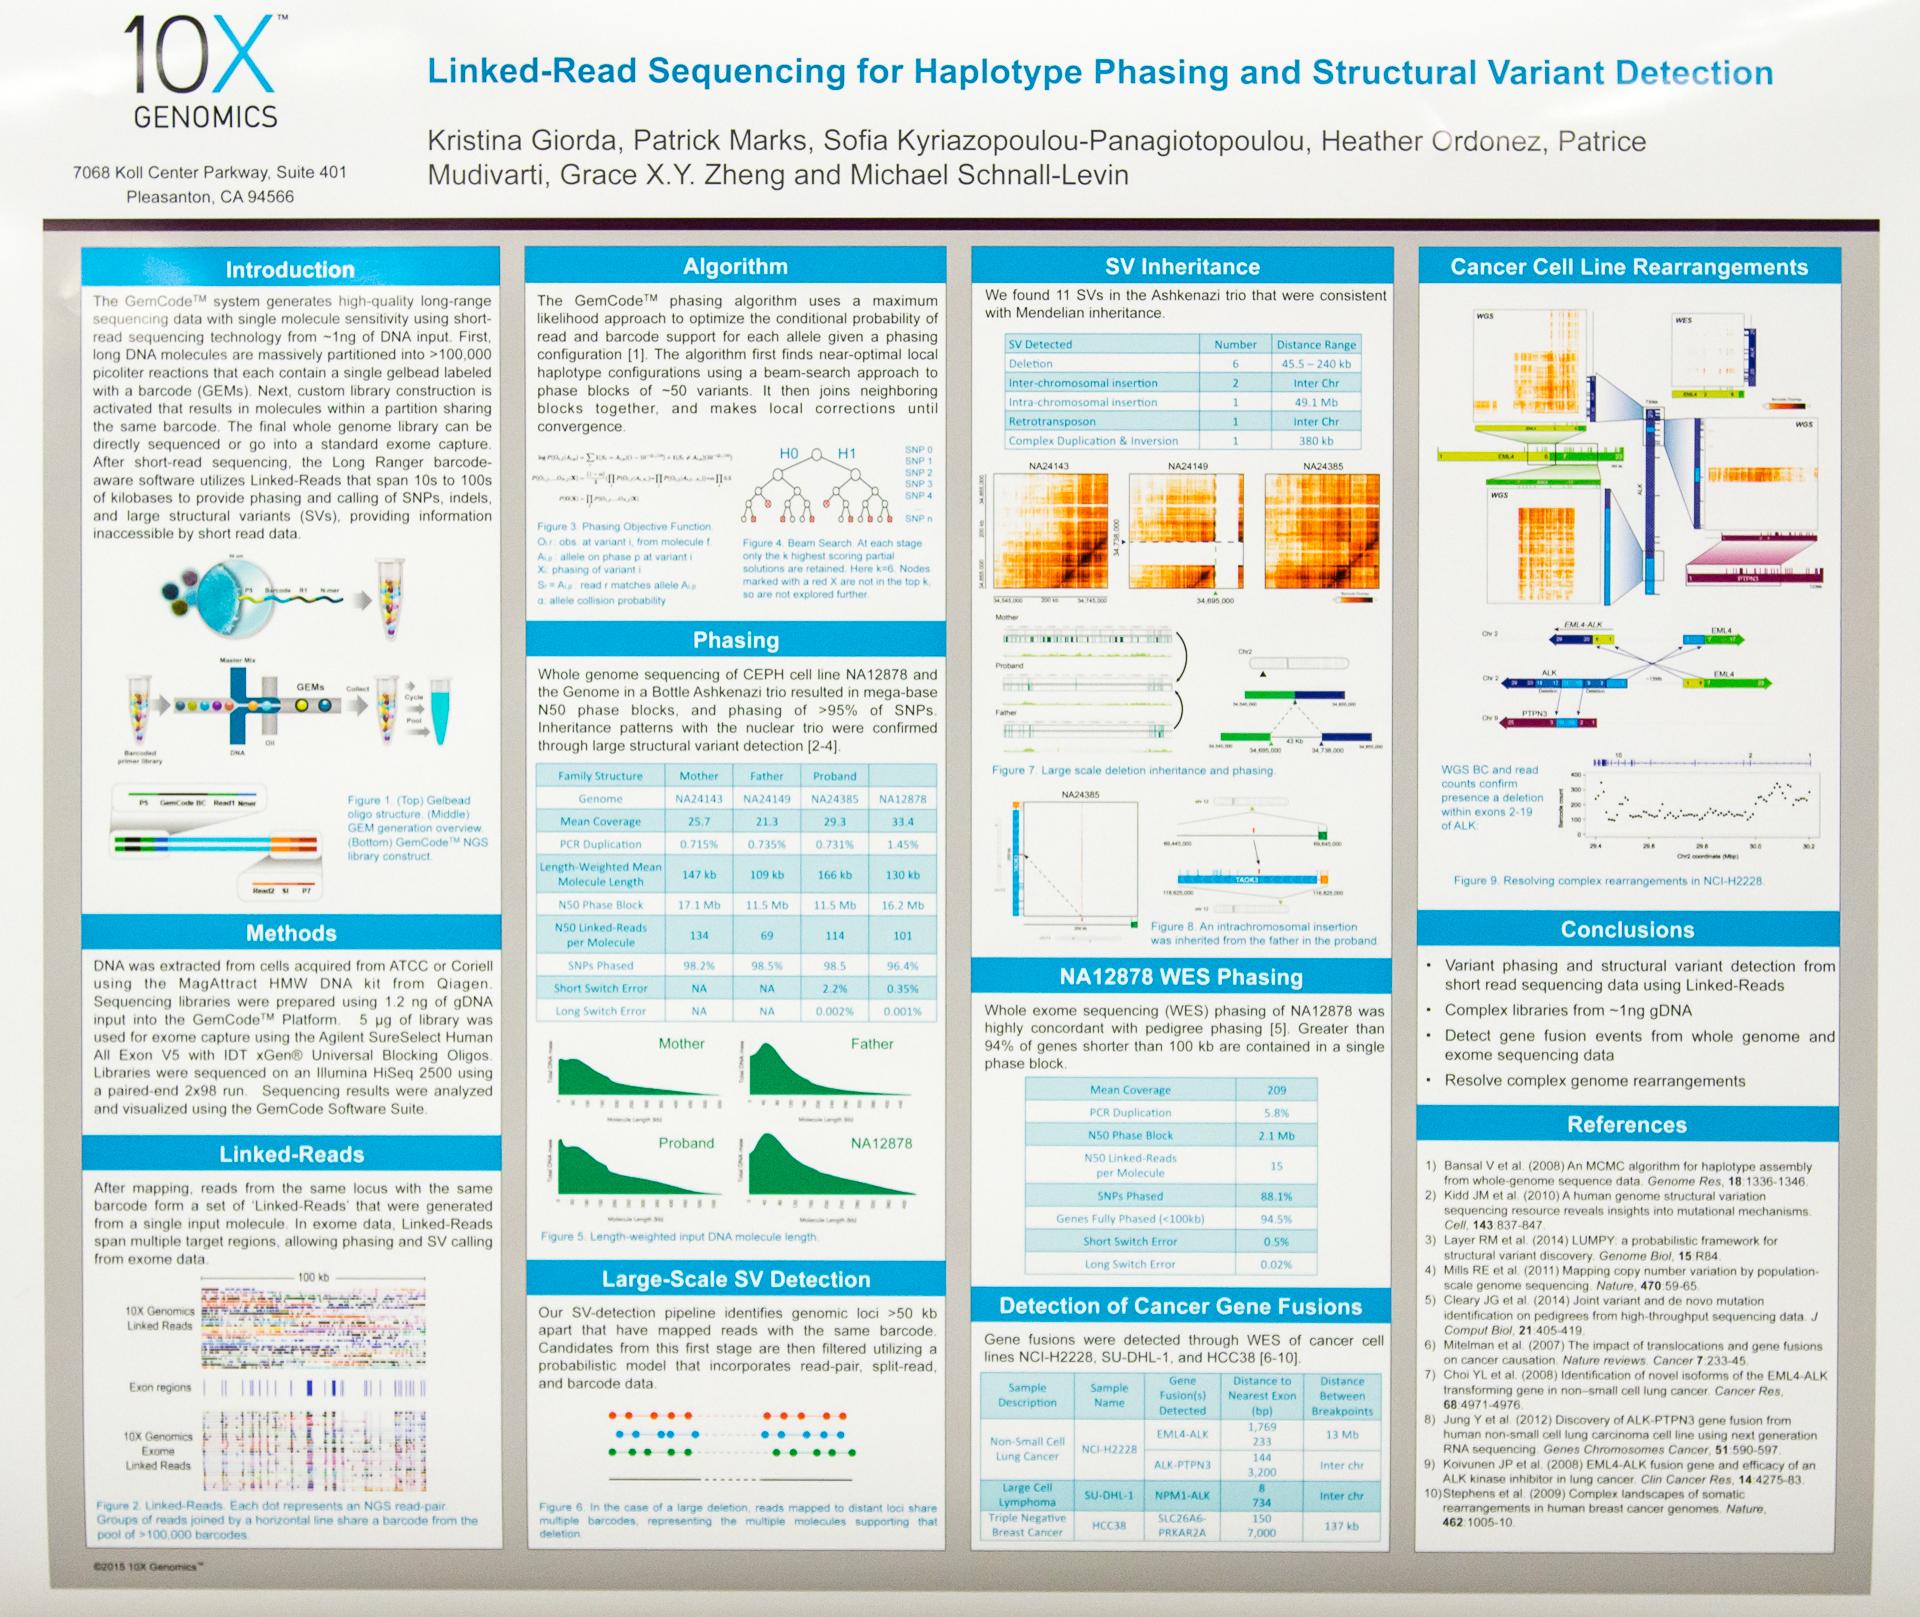 Link-Read Sequencing